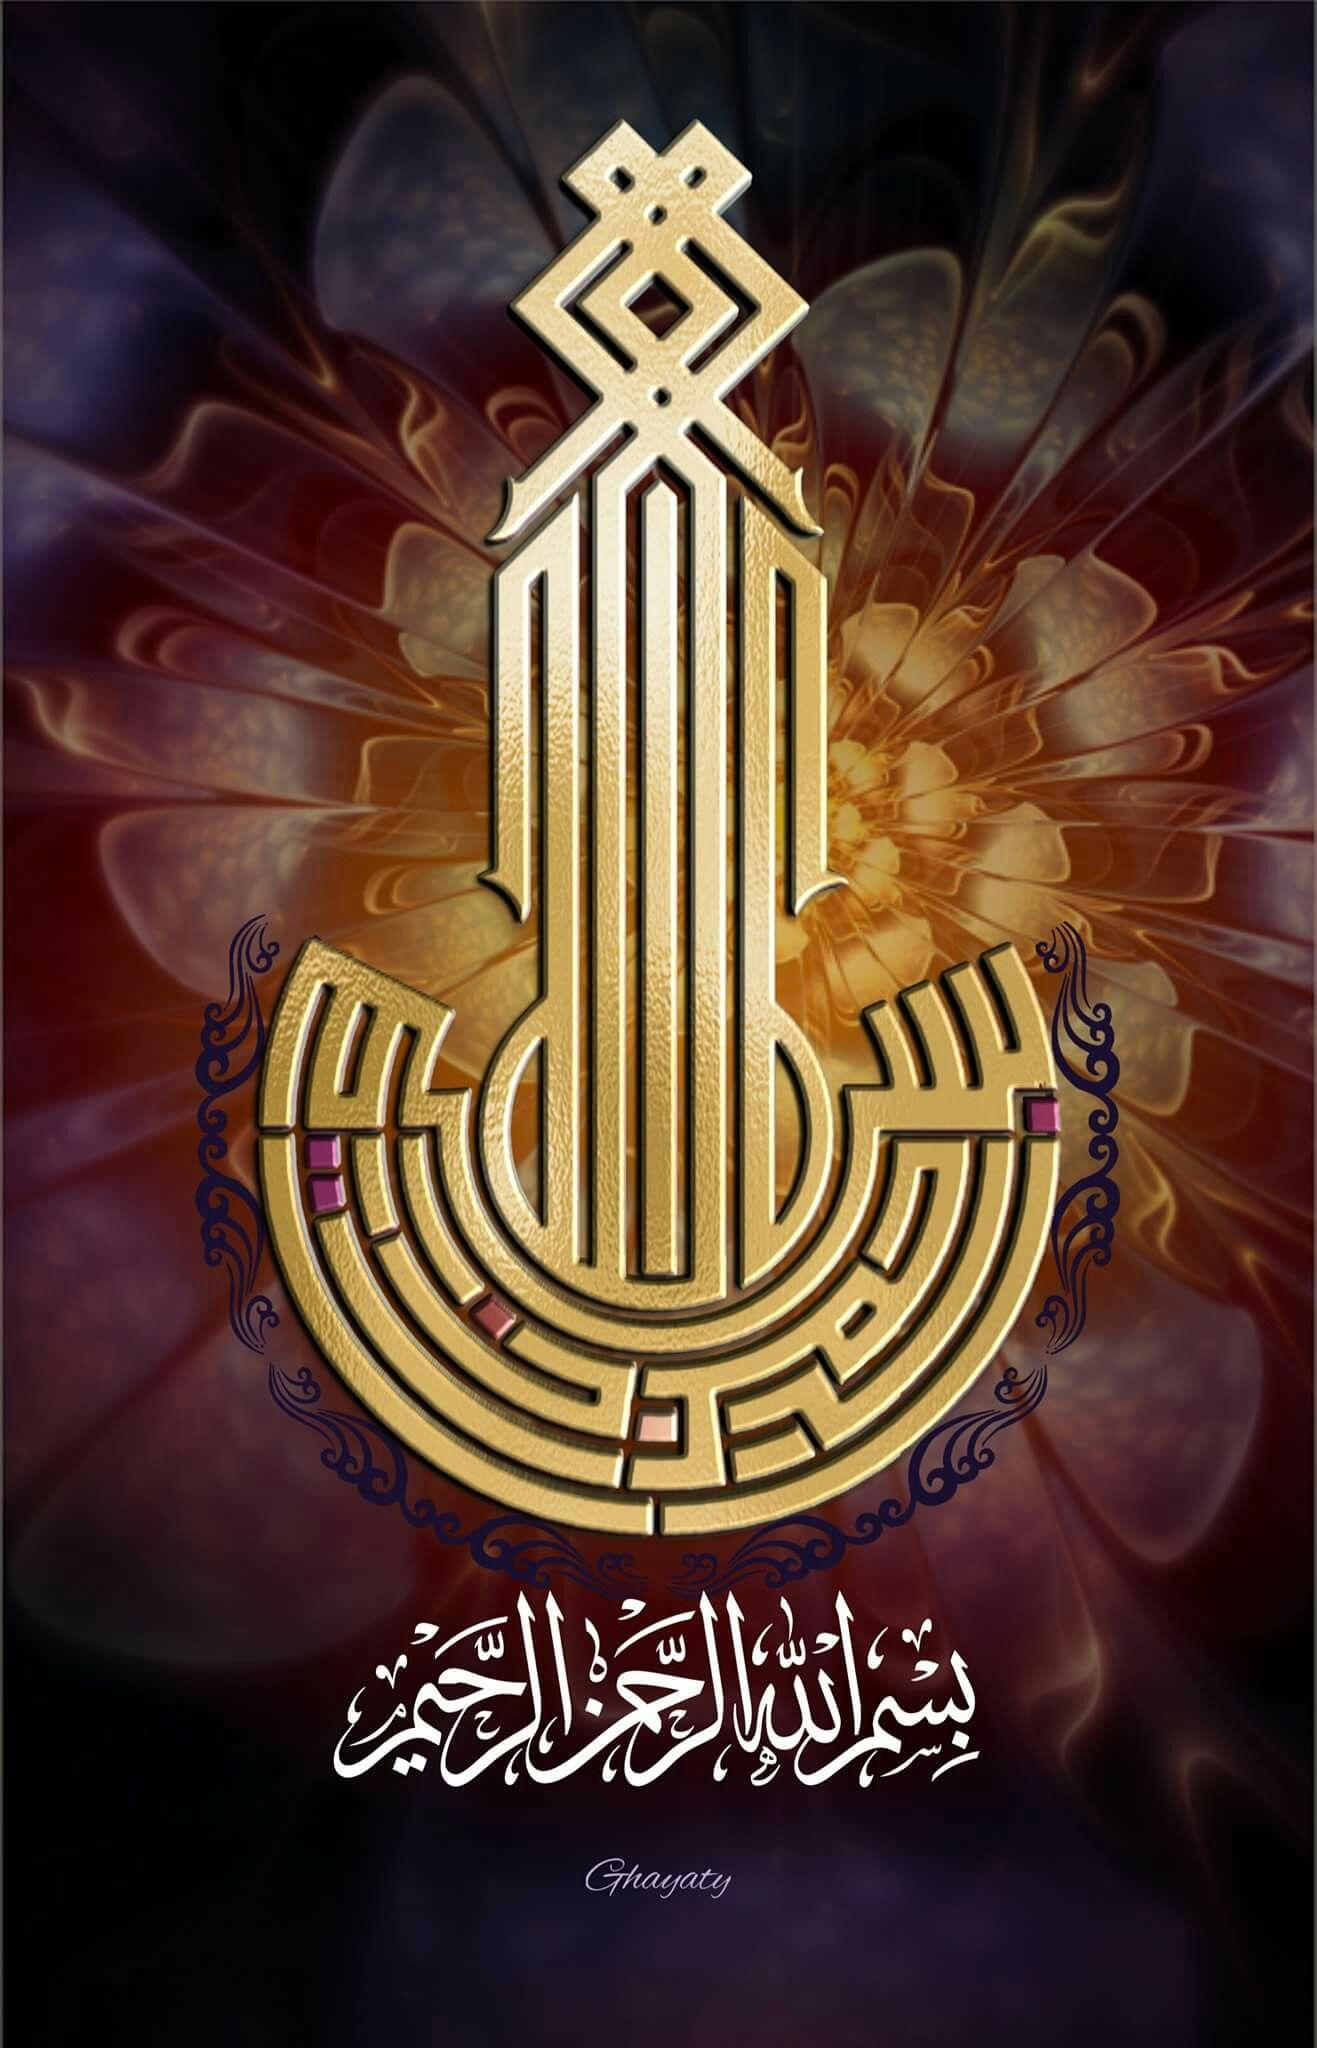 Kaligrafi Seni kaligrafi, Seni kaligrafi arab, Seni